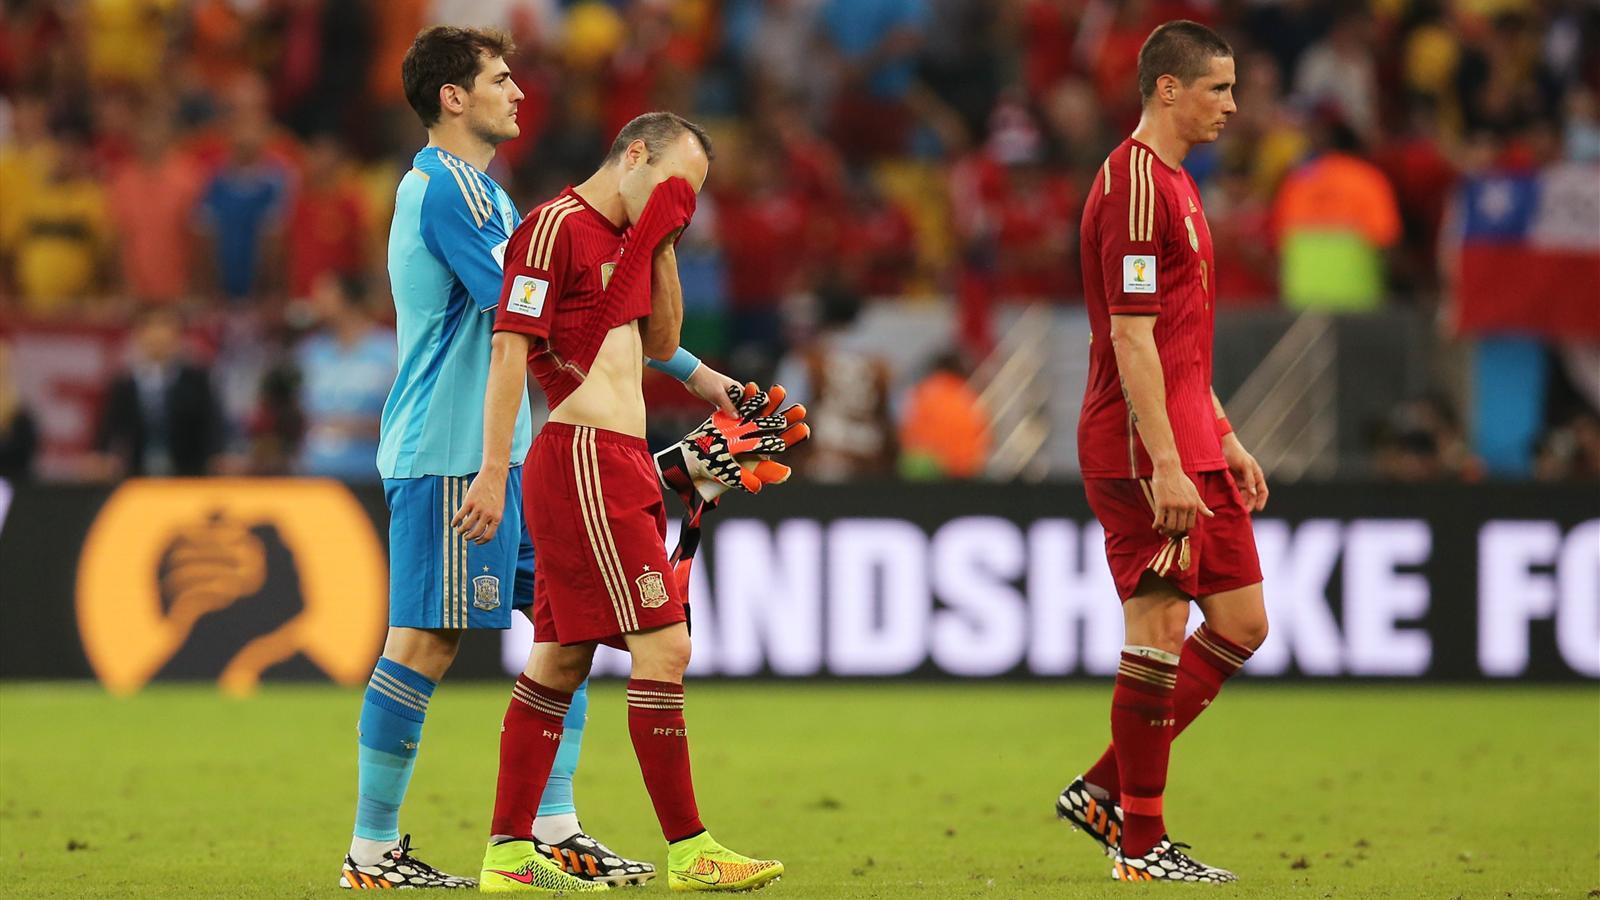 Футбол испания чем